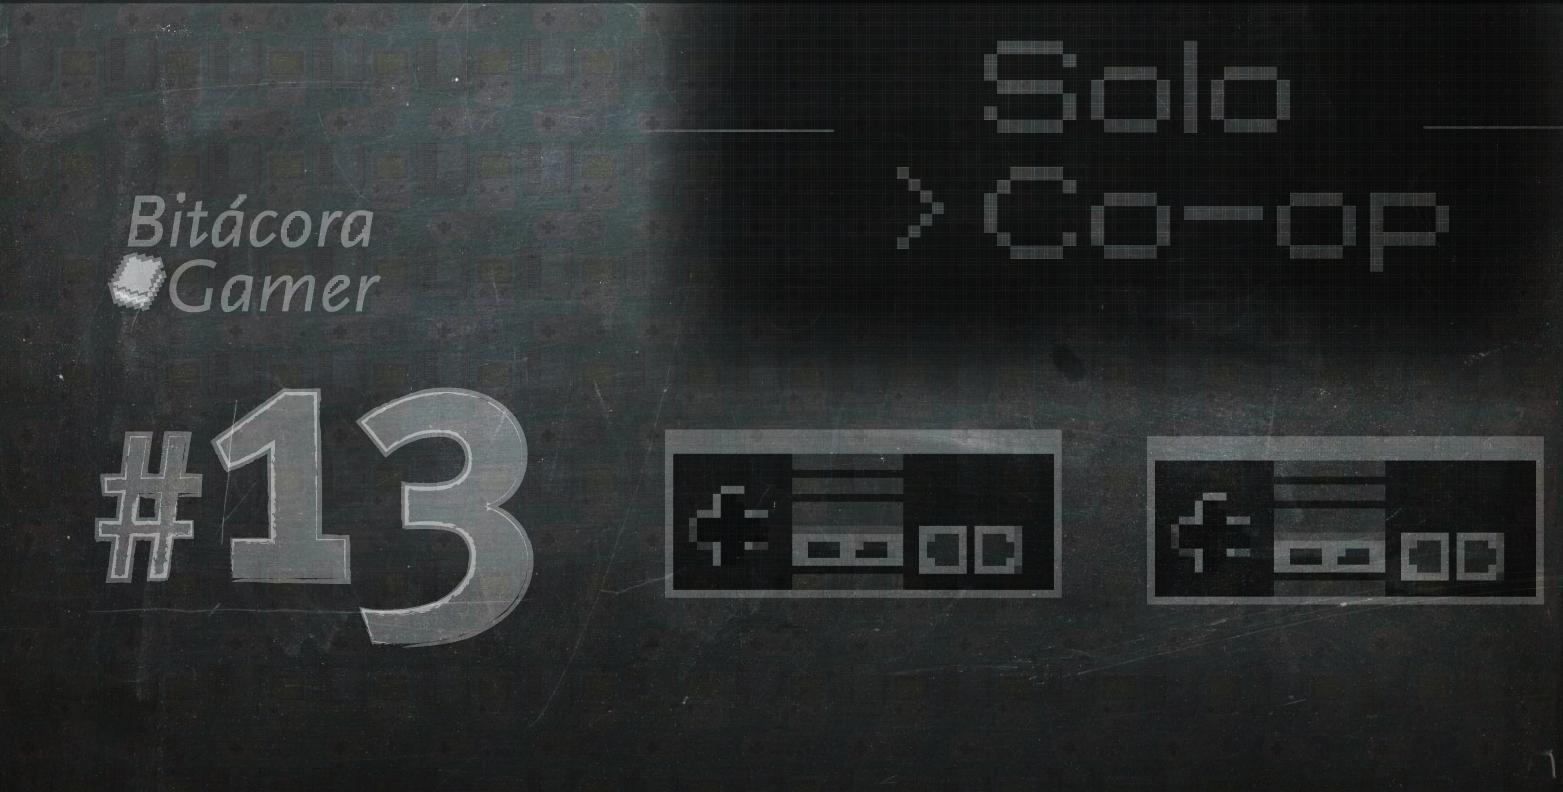 Enseñanzas de Videojuegos 13